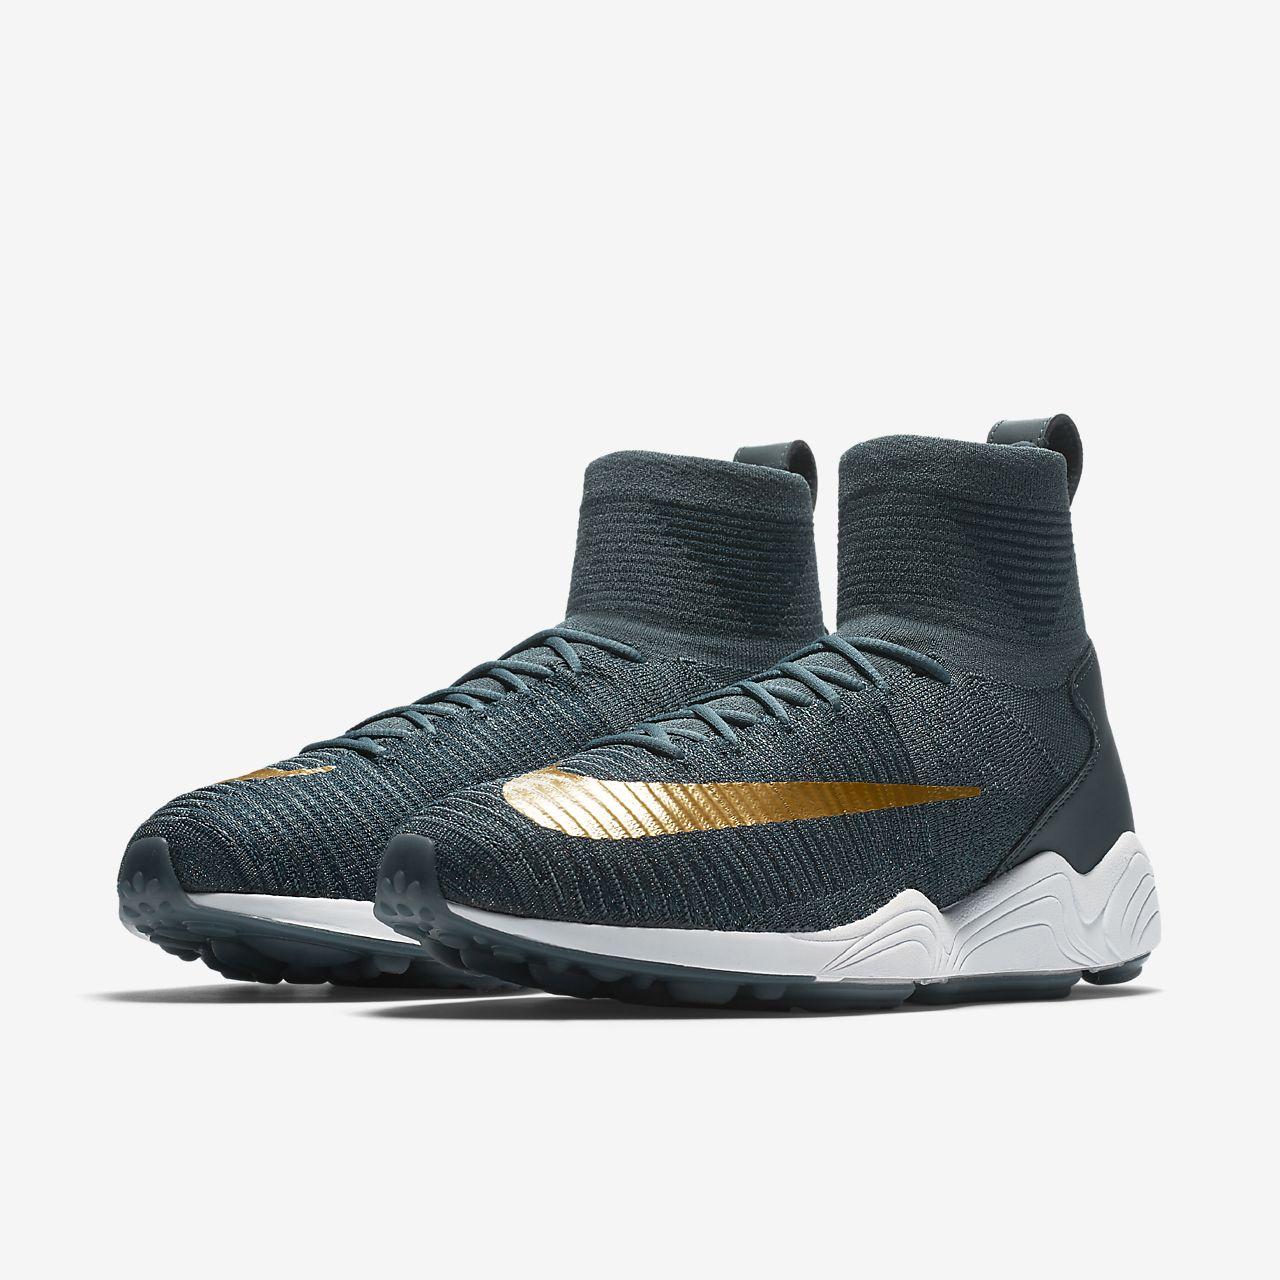 Chaussure Nike Homme Zoom Mercurial Flyknit pour Homme Nike Bleu Livraison 3b5495